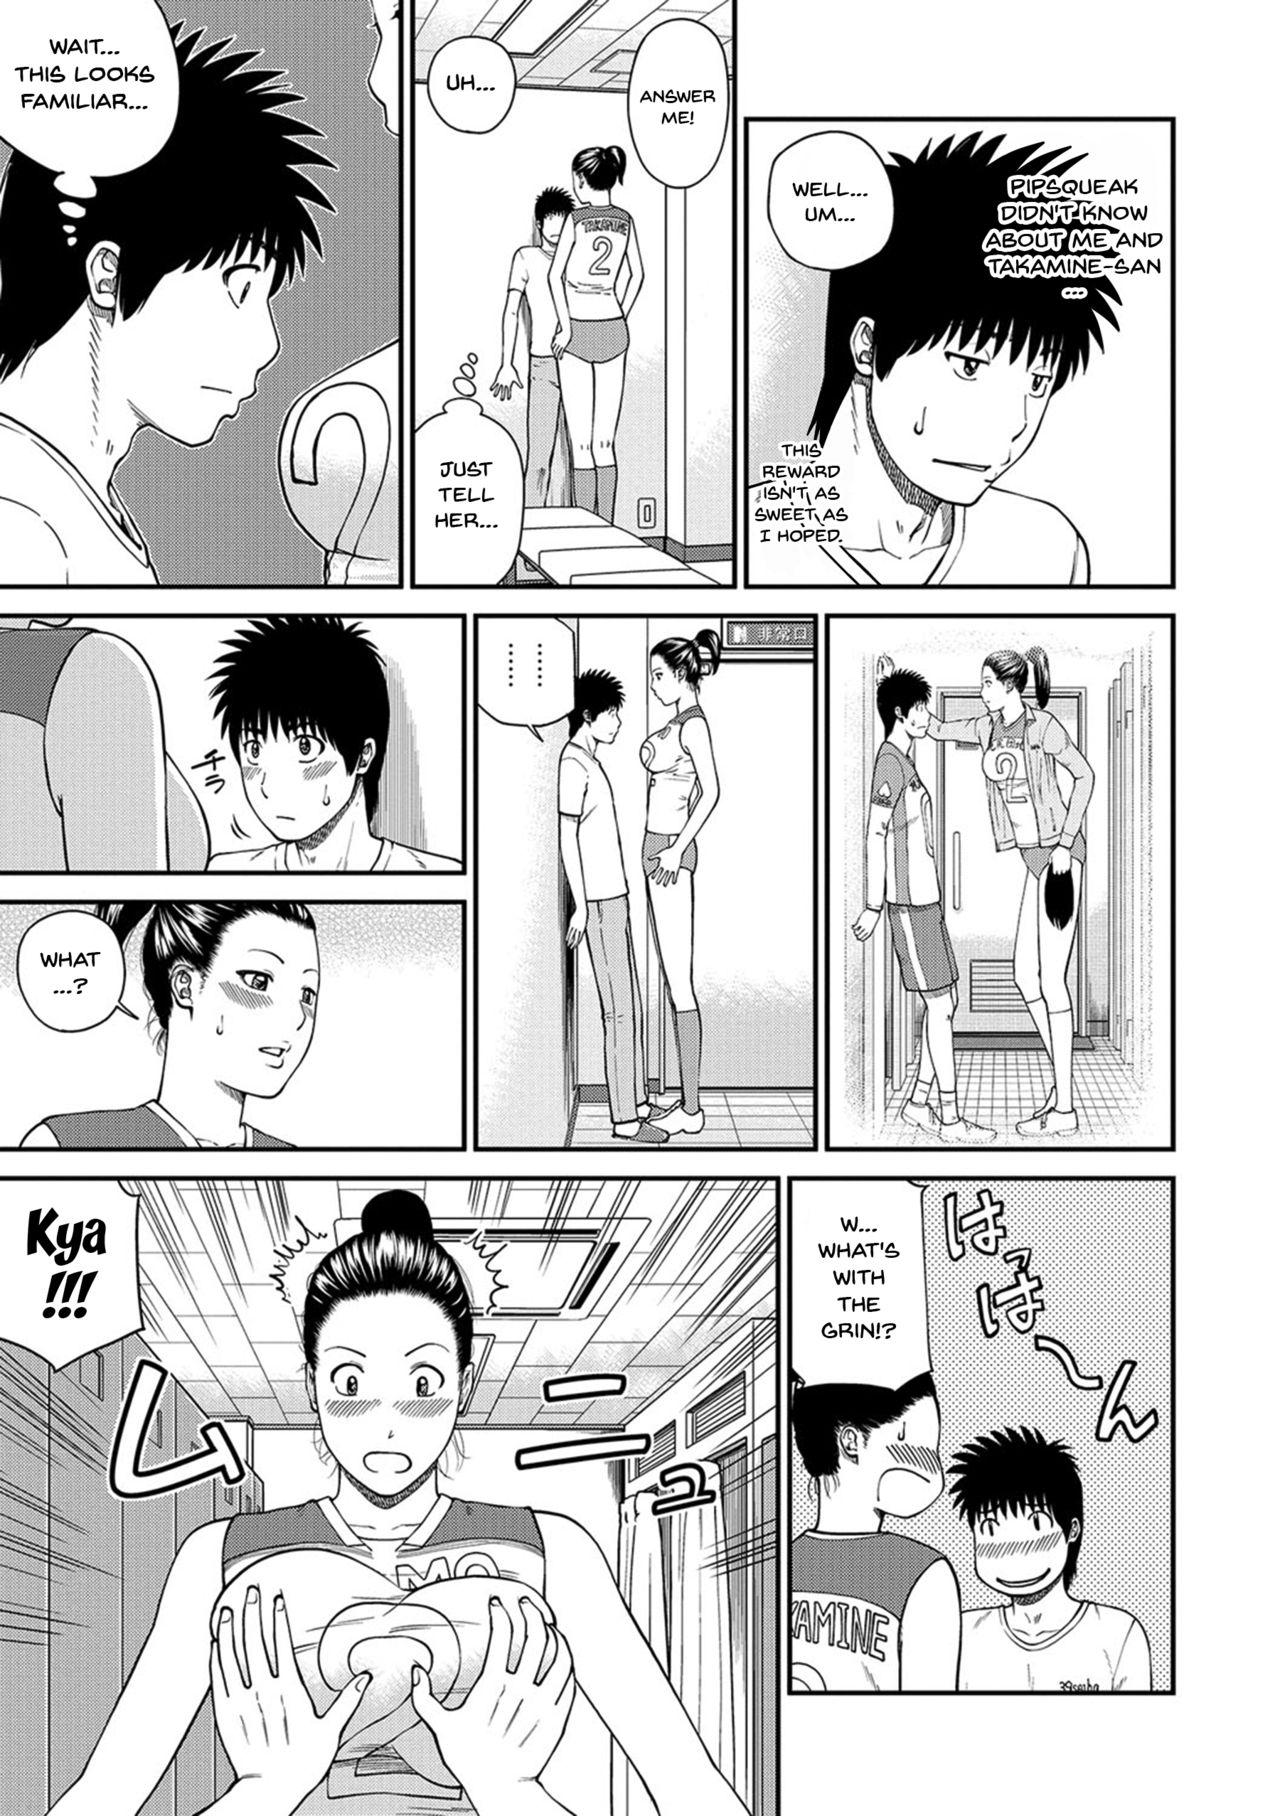 [Kuroki Hidehiko] Momojiri Danchi Mama-san Volley Doukoukai - Mom's Volley Ball | Momojiri District Mature Women's Volleyball Club Ch.1-9 [English] {Doujins.com} [Digital] 106